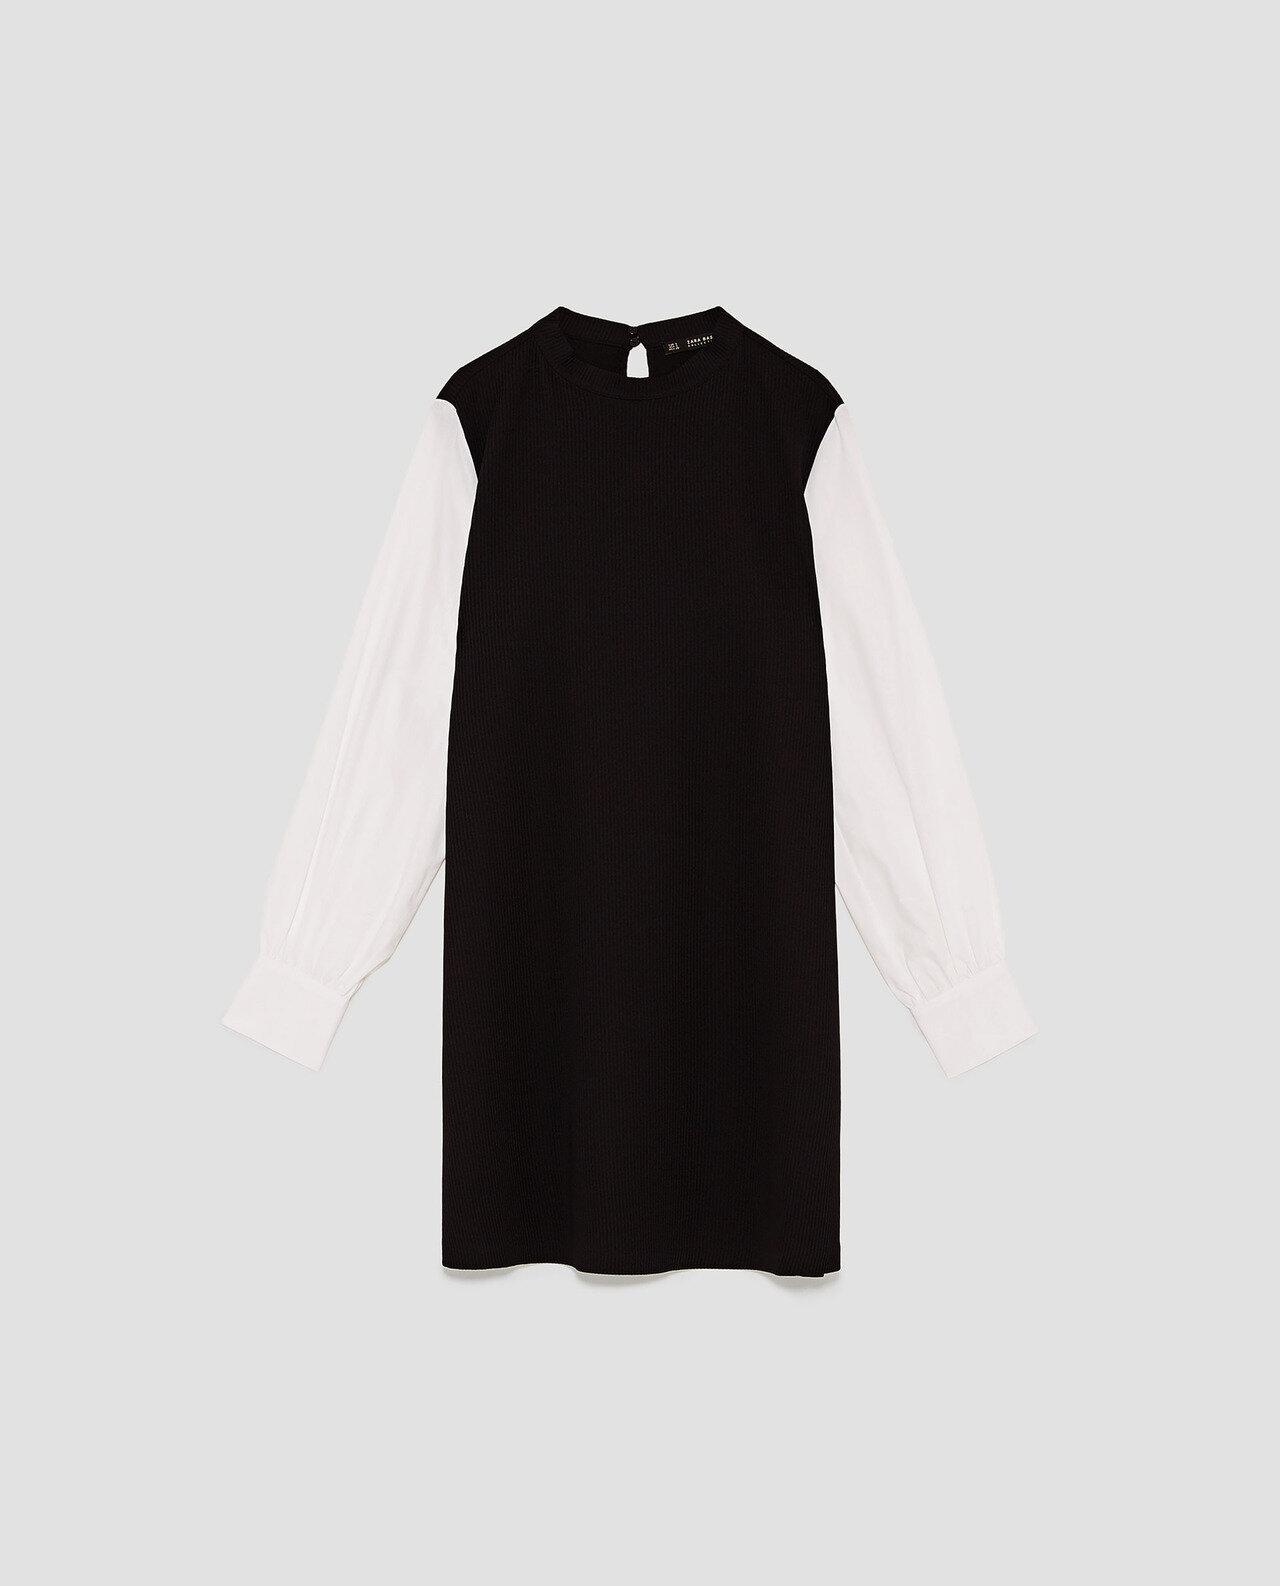 Zara Dress with Contrasting Sleeves.jpg